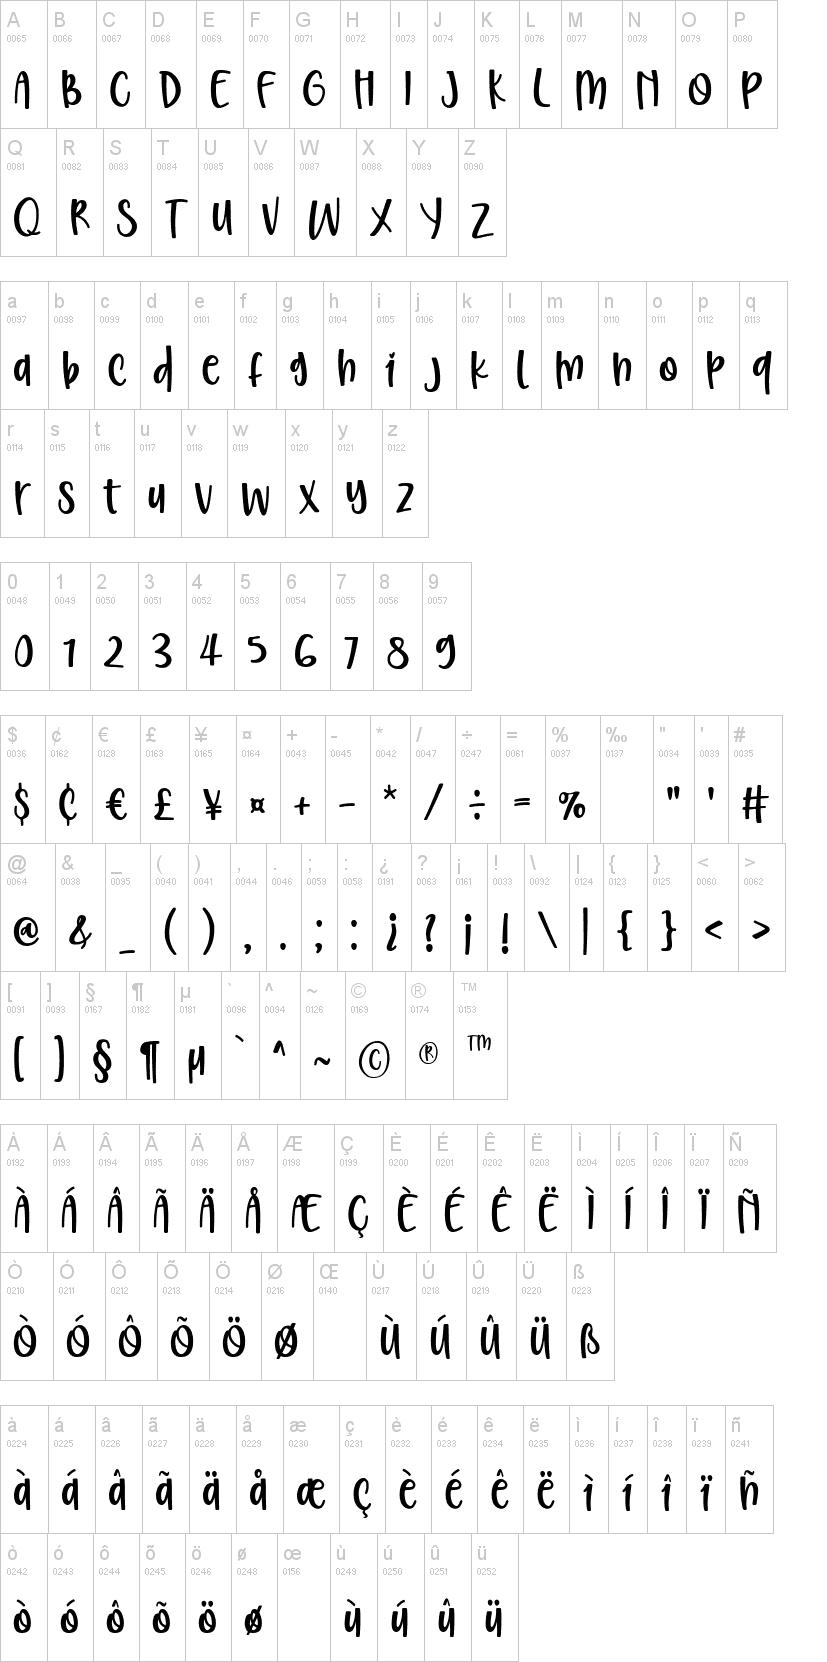 Christed Font-1